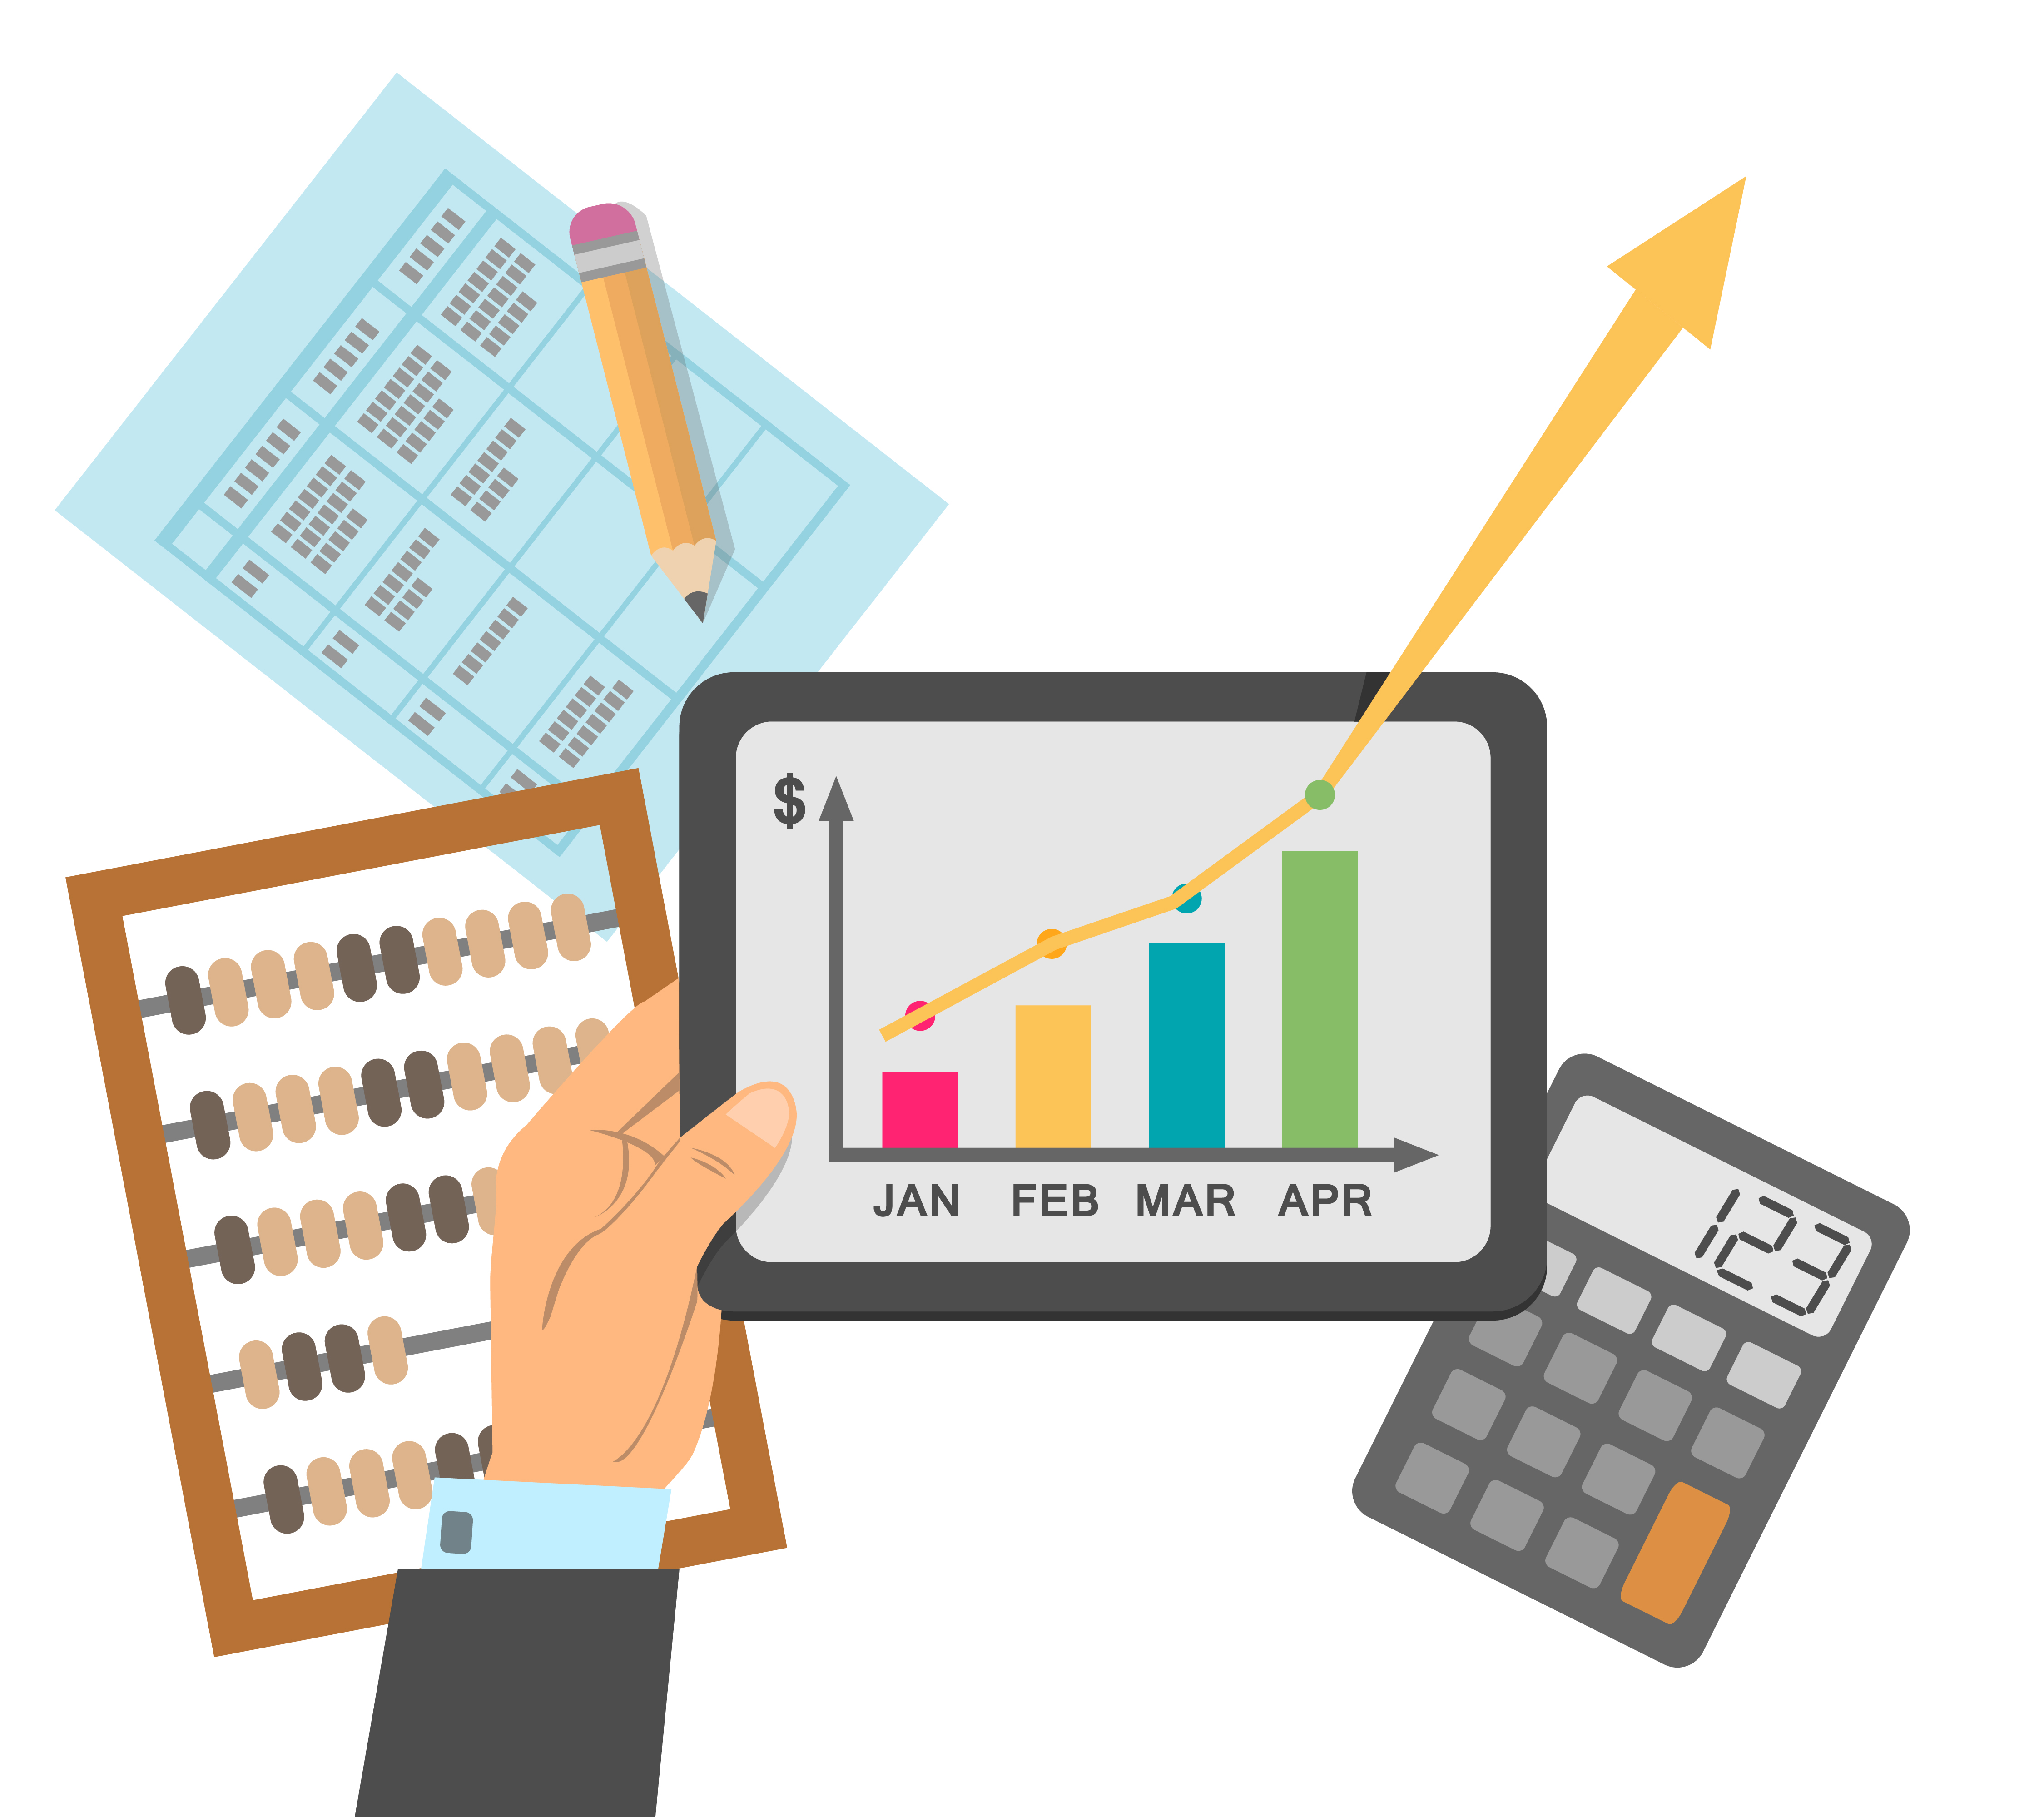 Financial business plan